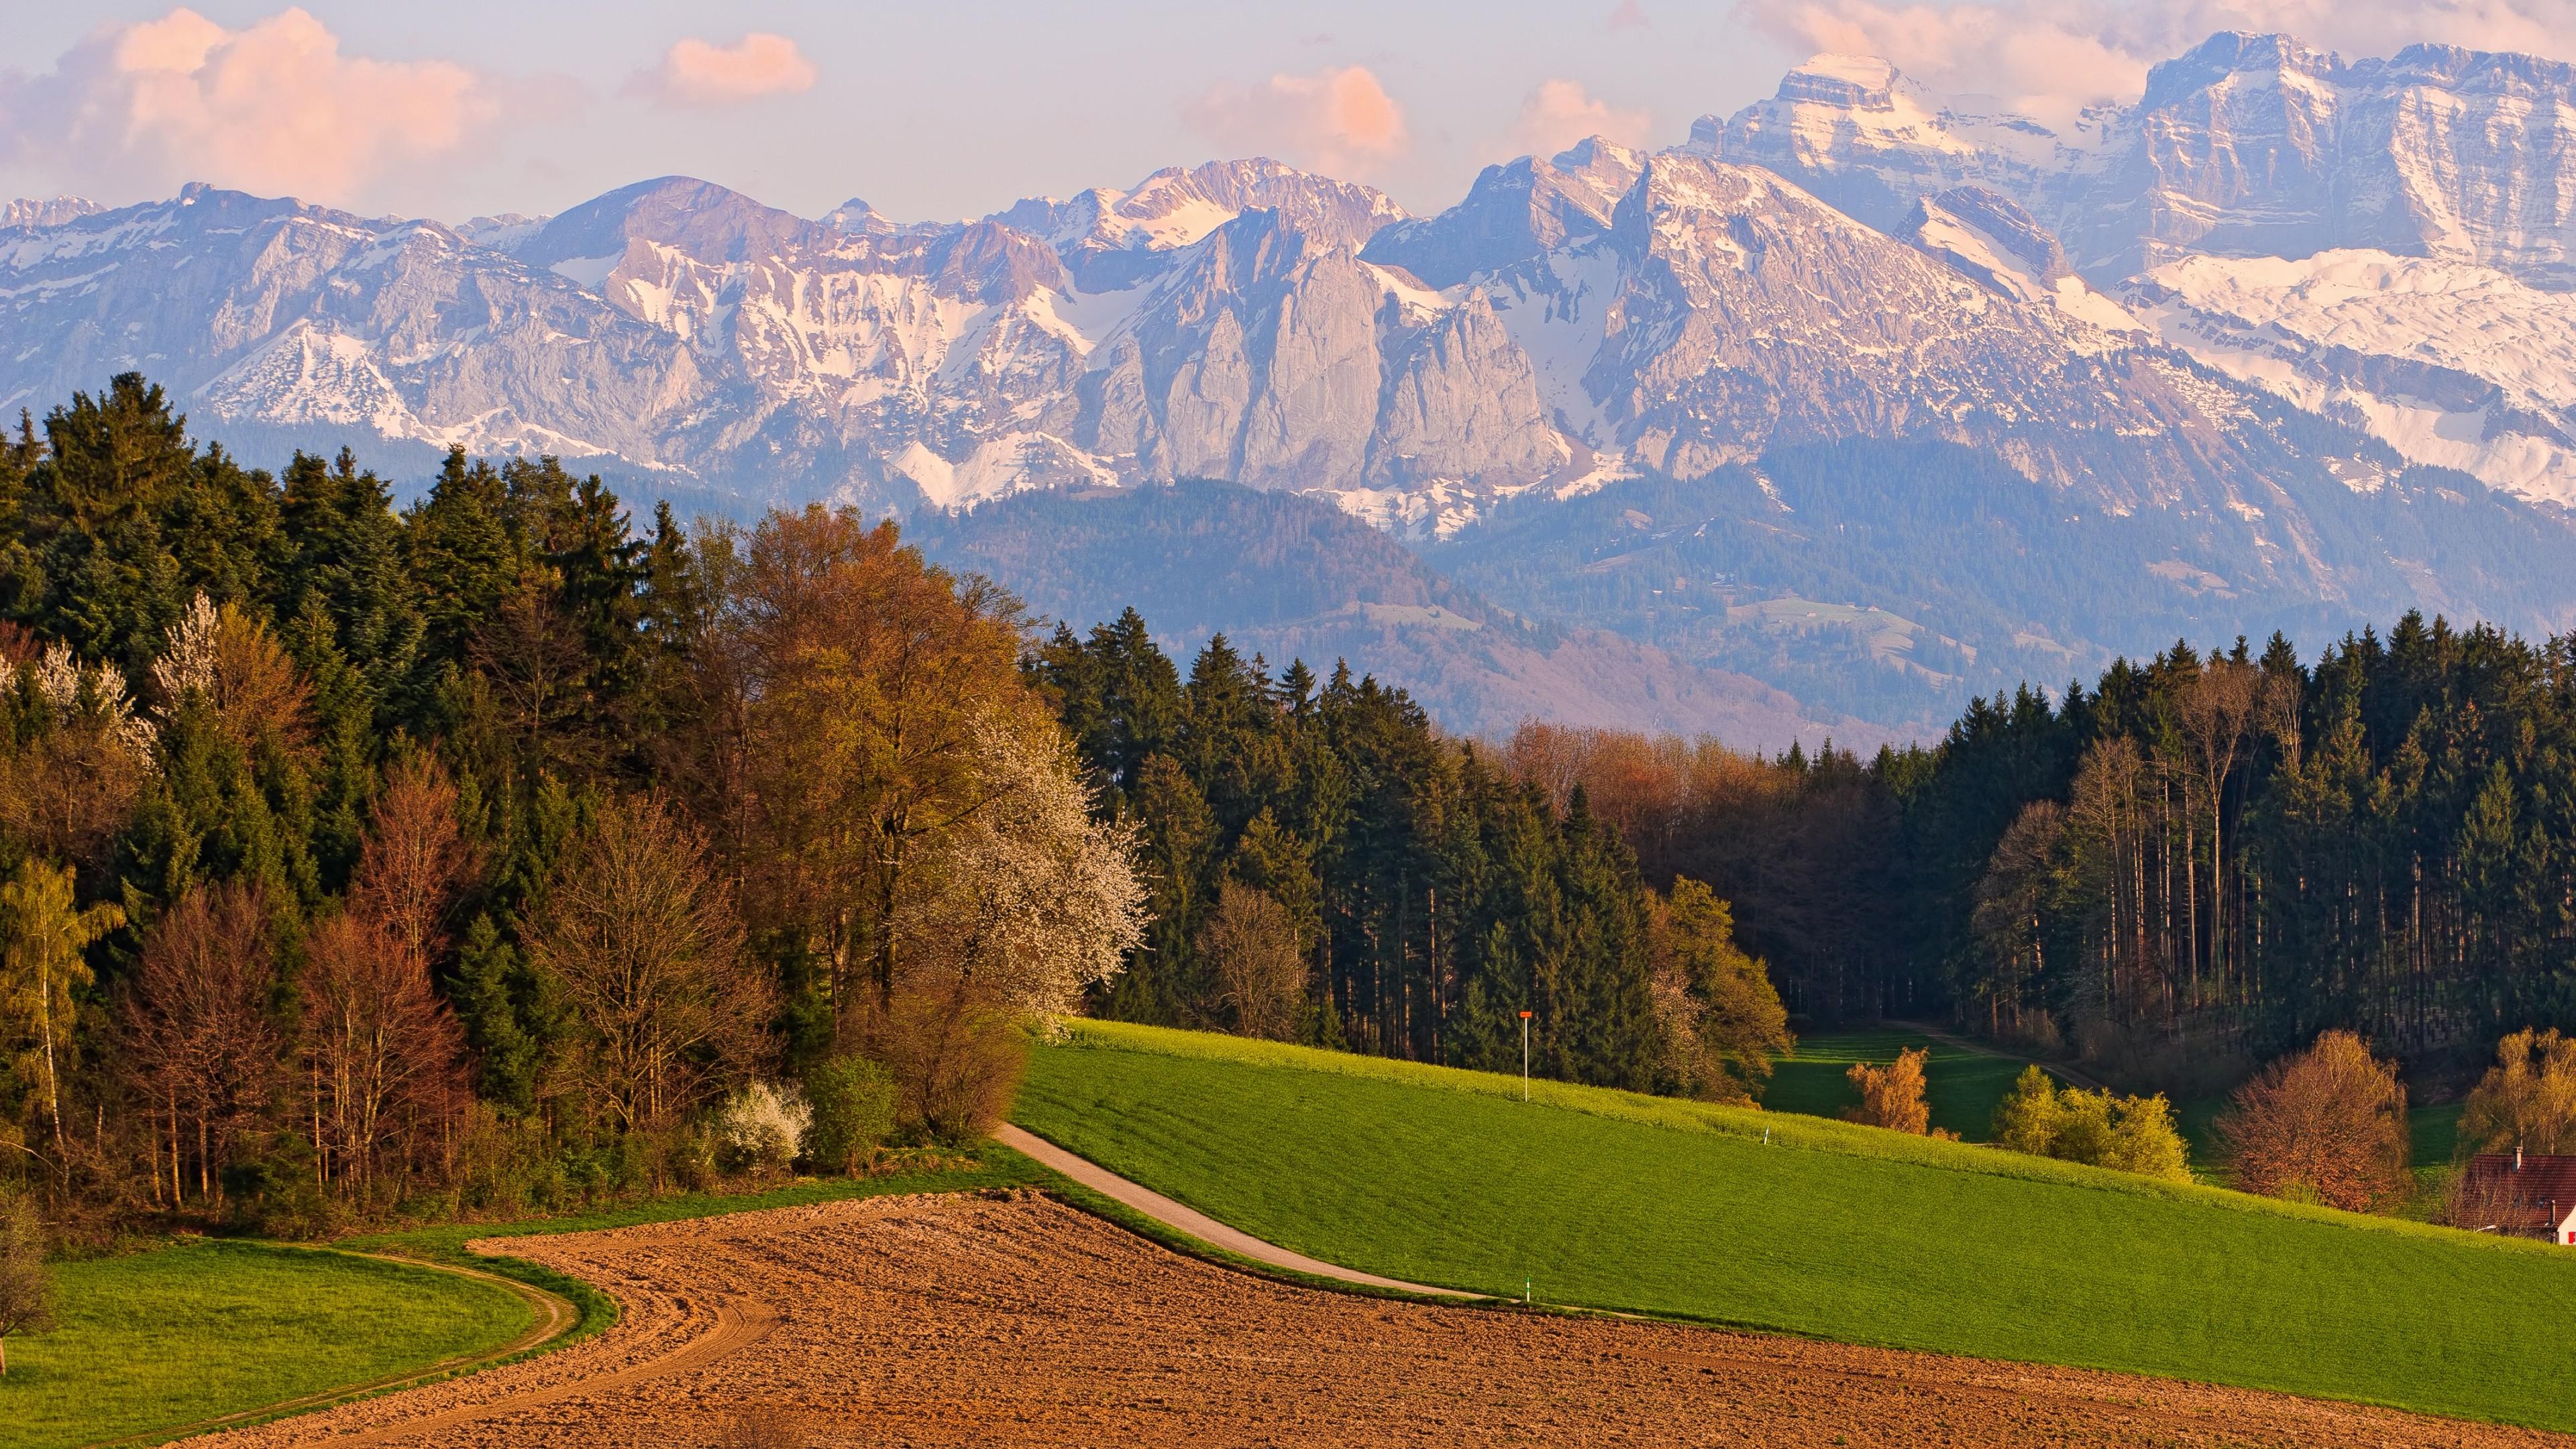 Switzerland wallpaper wallpapertag - Switzerland wallpaper full hd ...